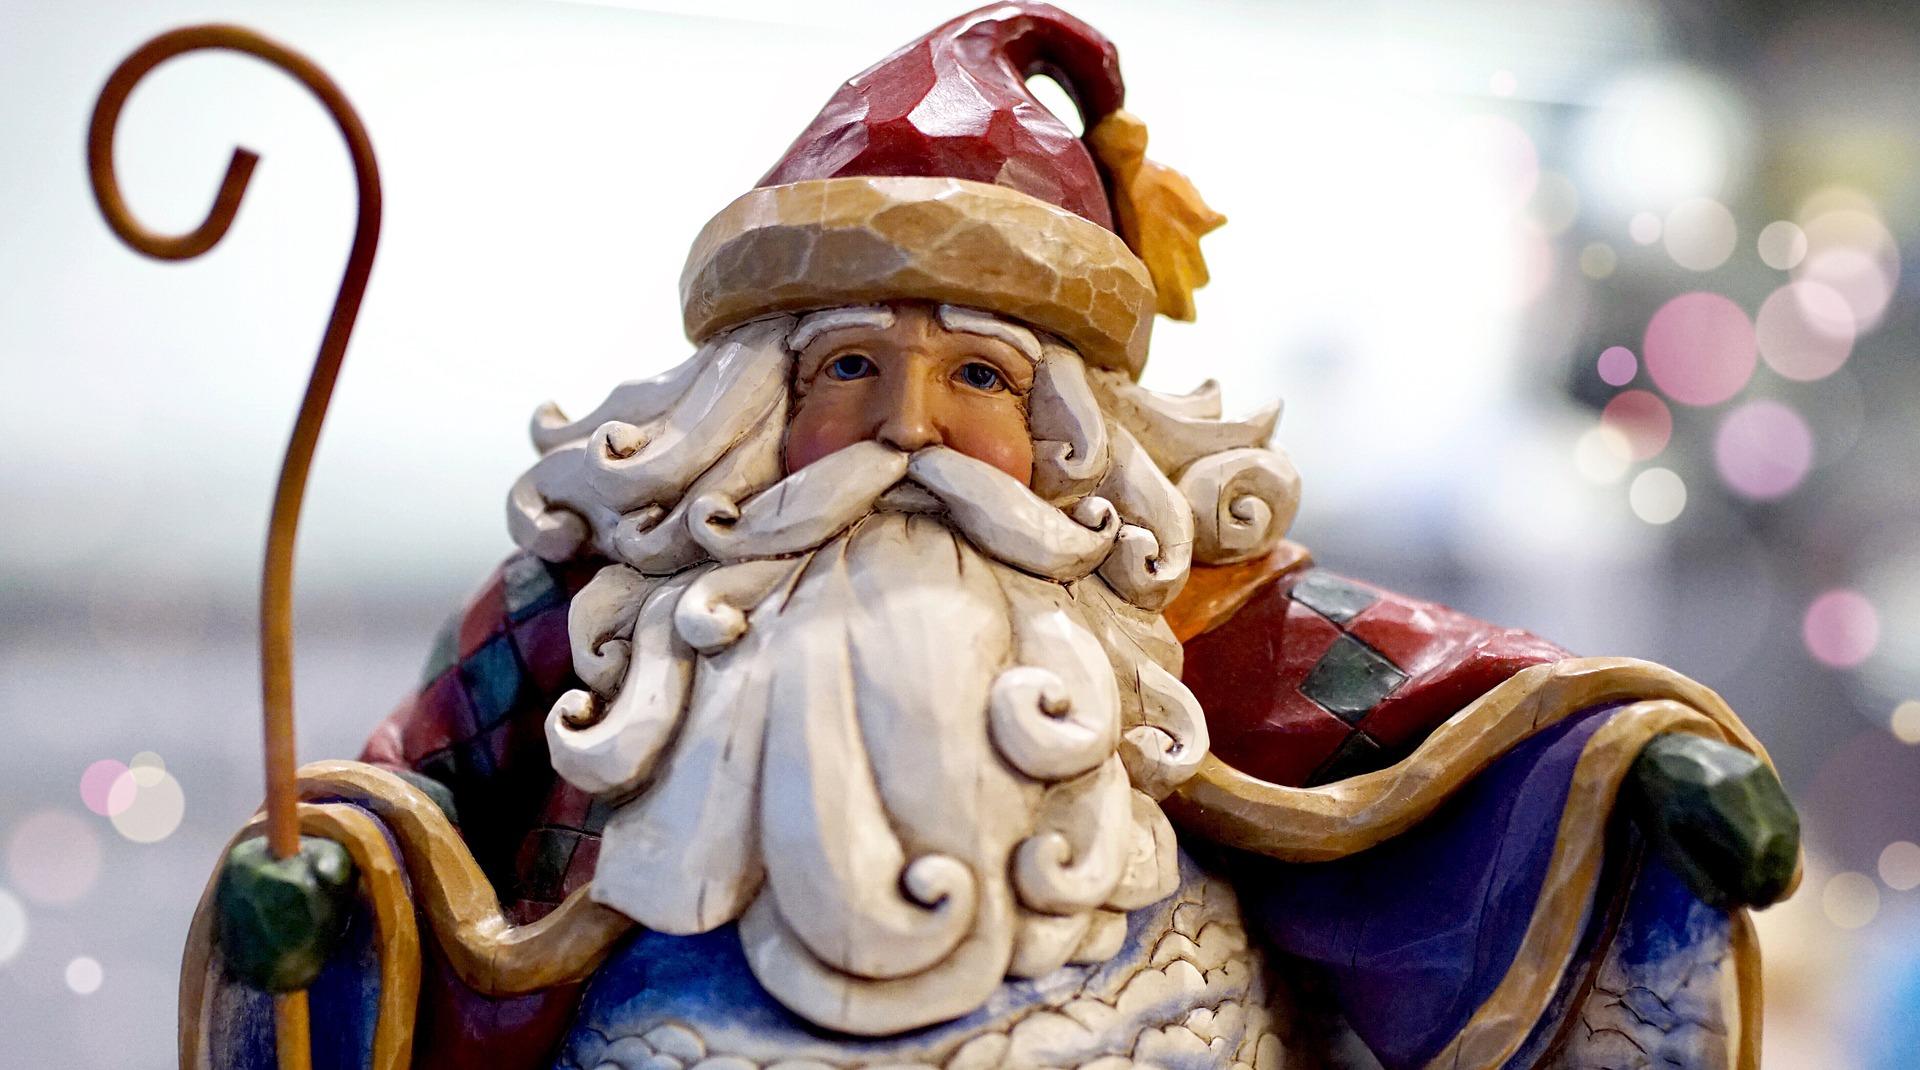 Celebrate Saint Nicholas